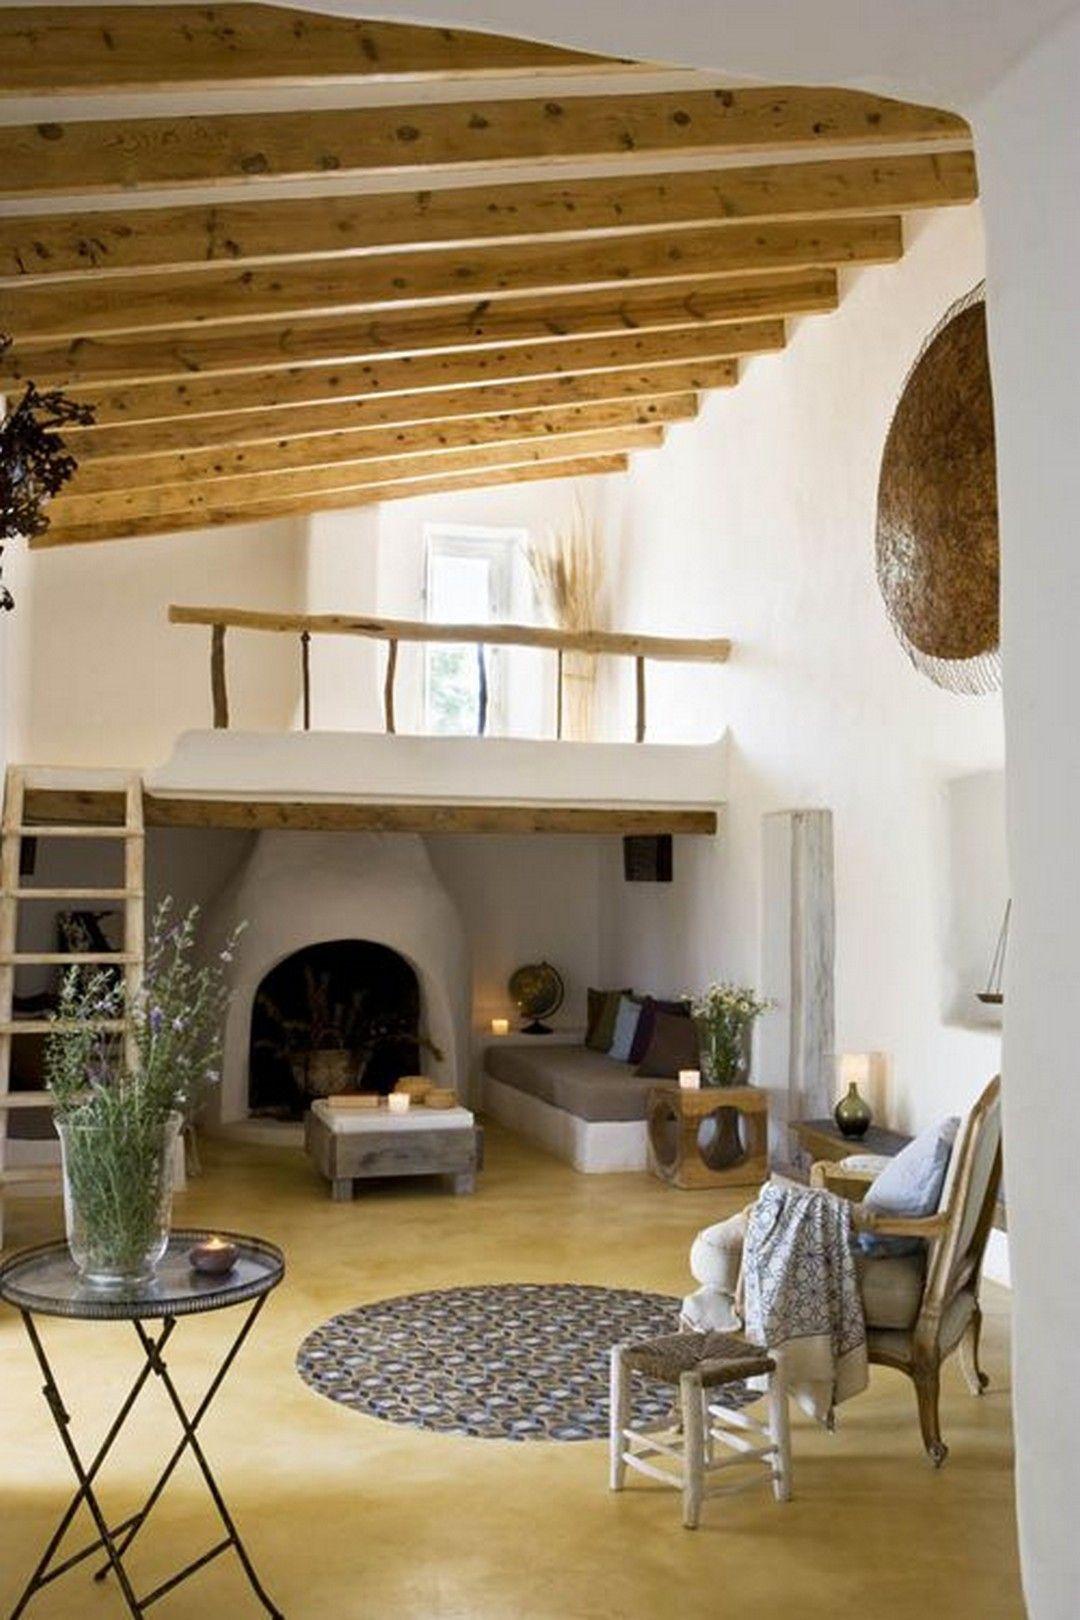 Spanish Farmhouse Design 99 Inpiration Photos